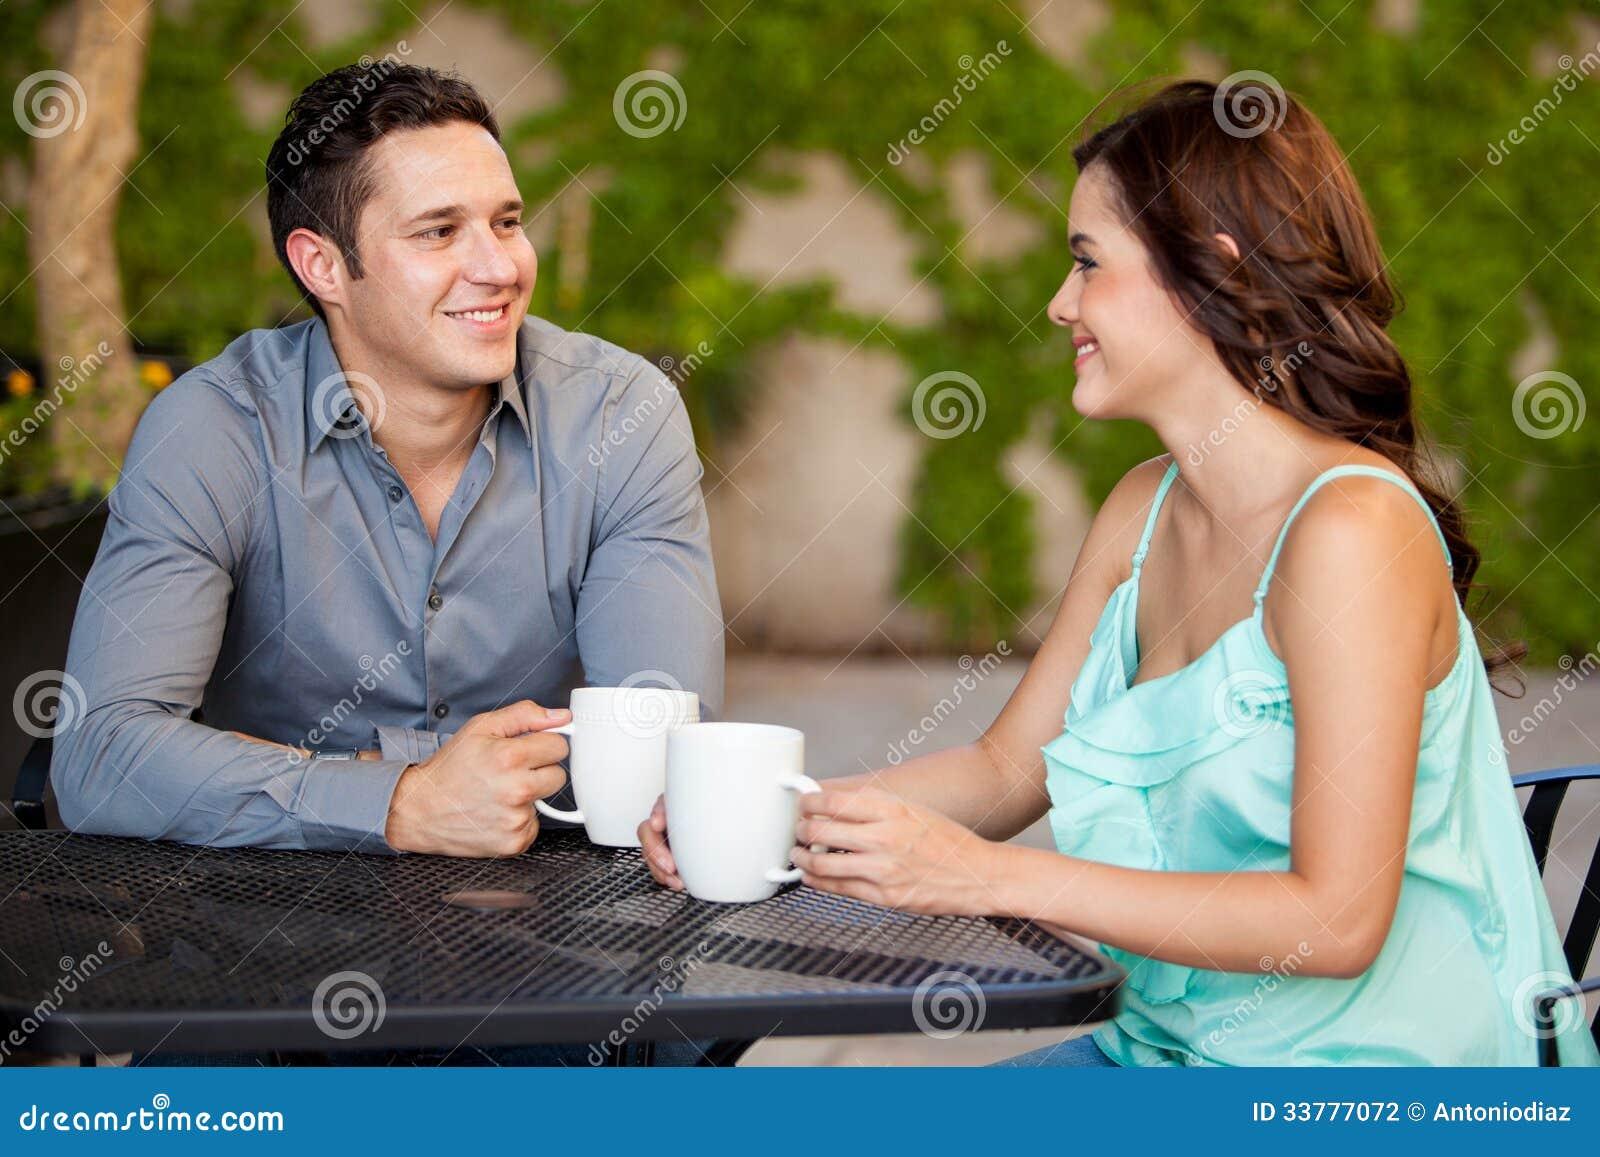 asian dating agency in sydney